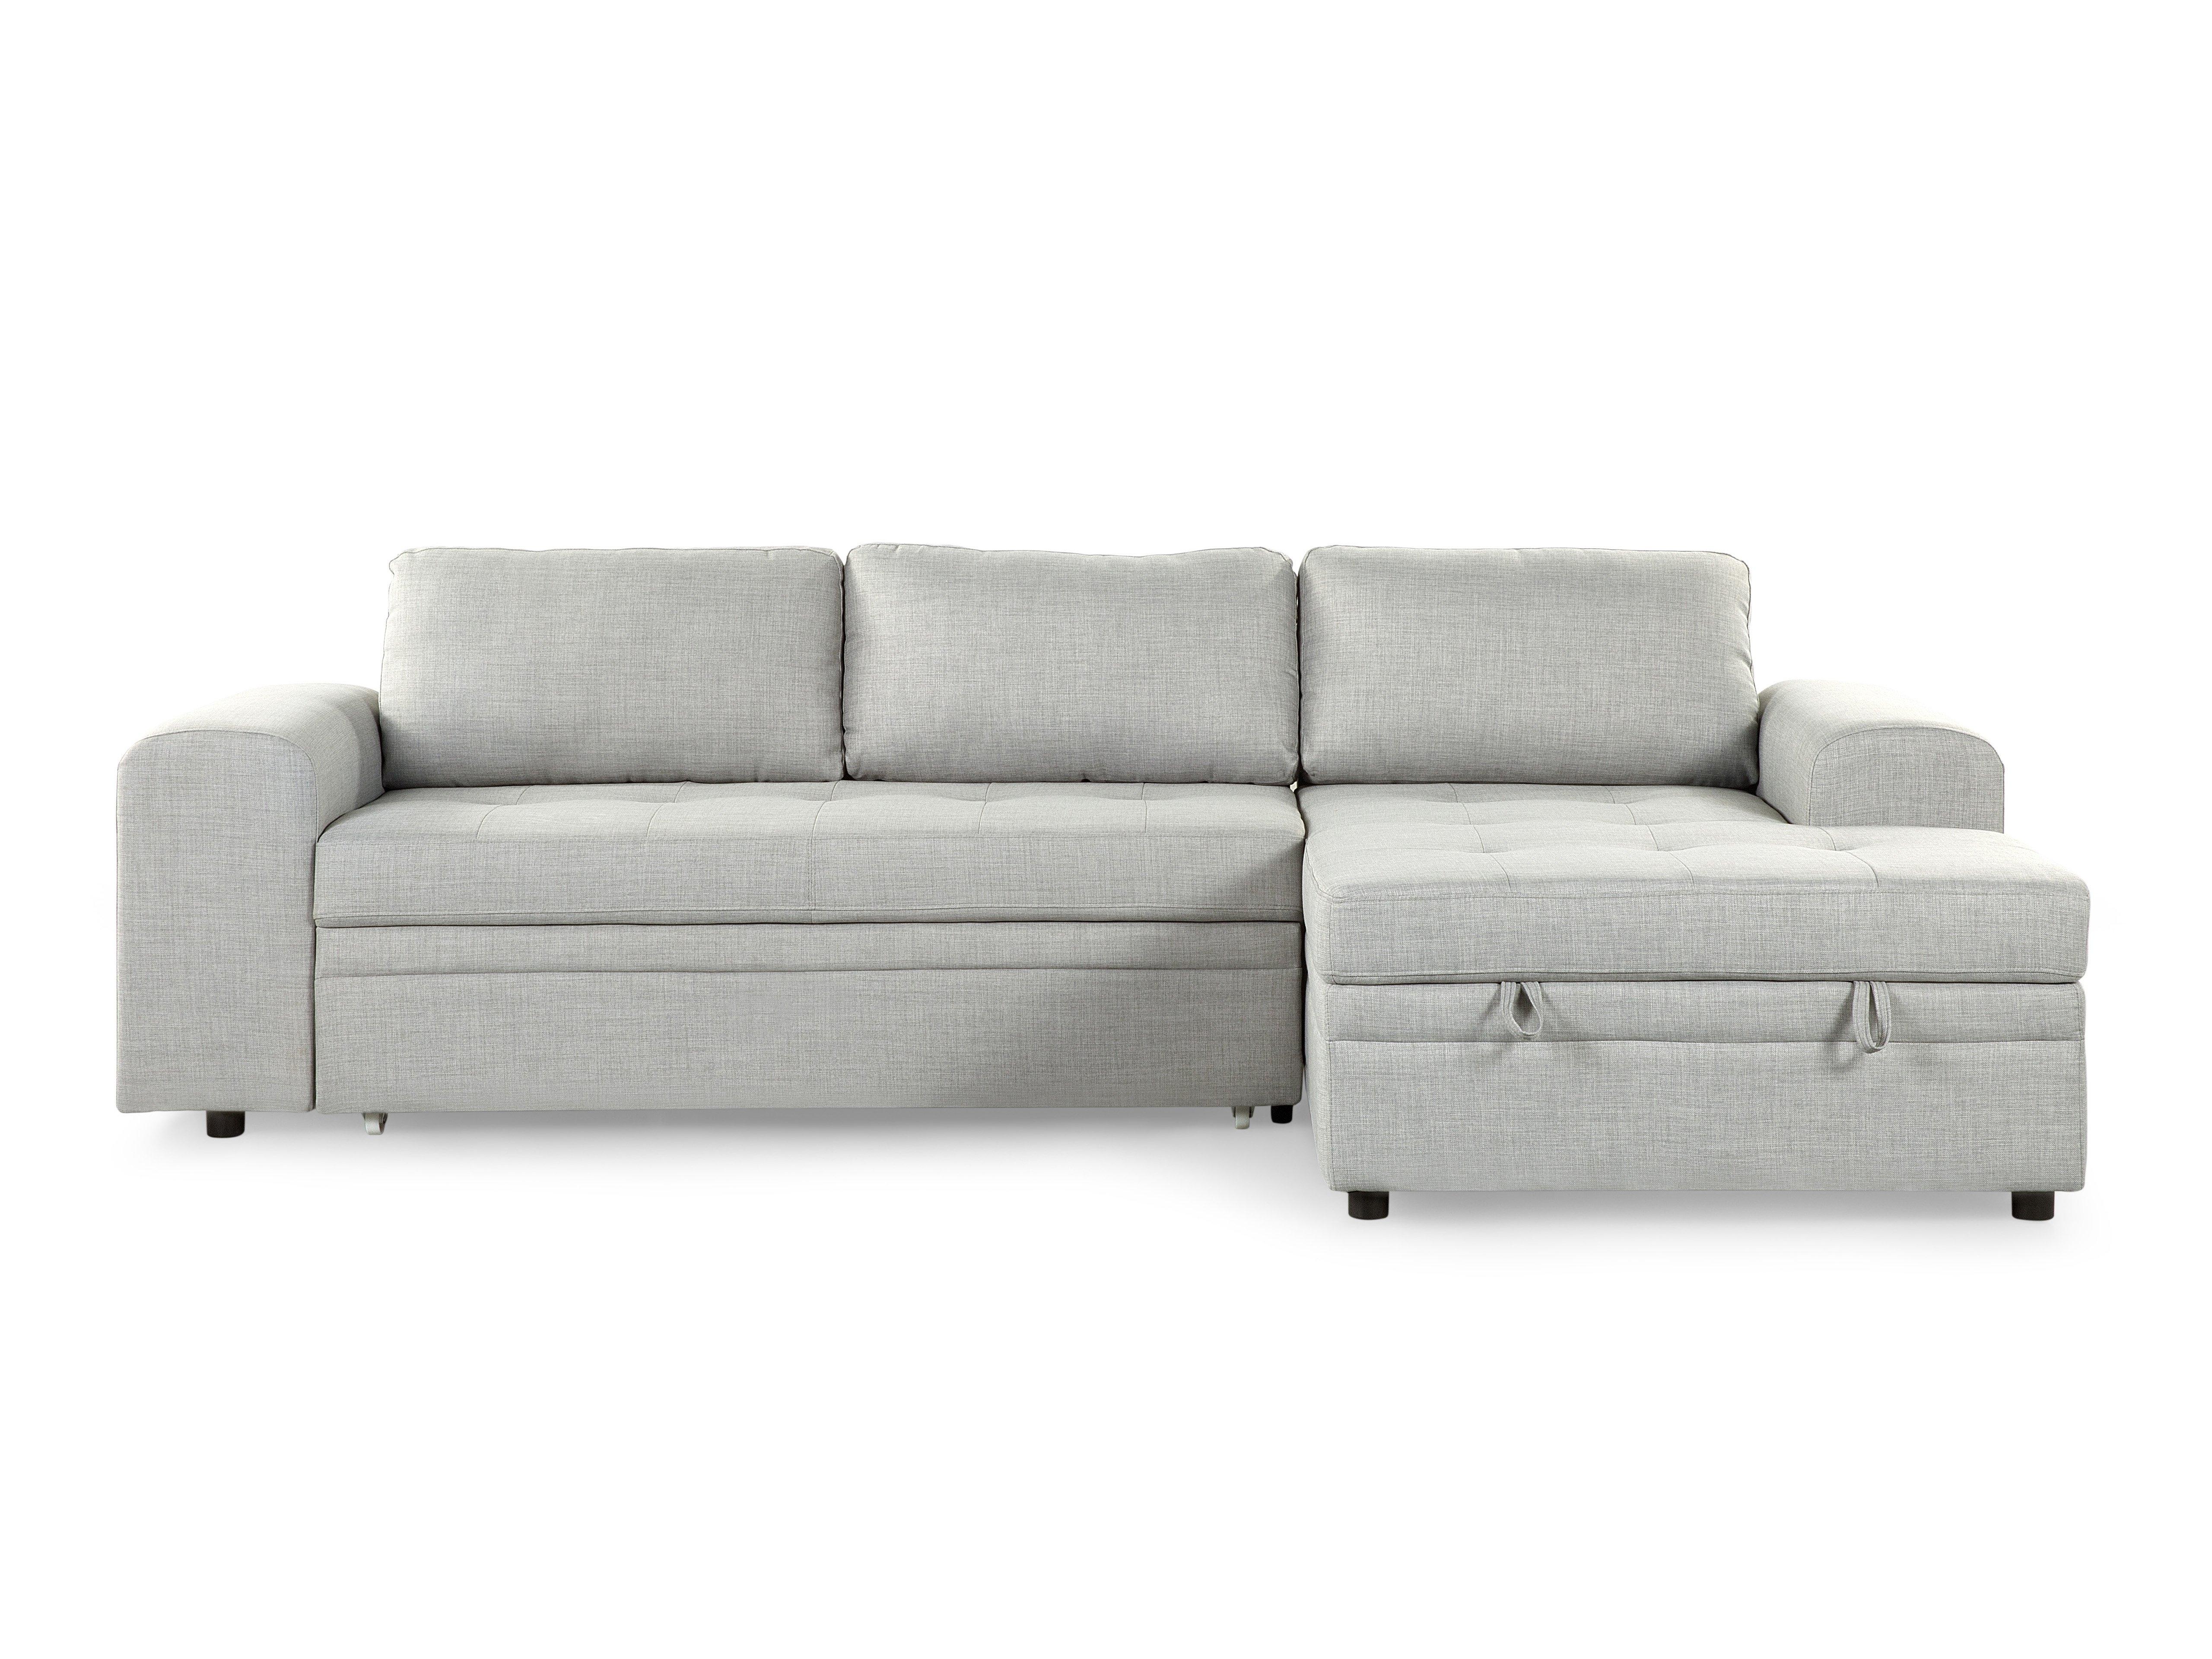 Most Popular Chaise Lounge Sleeper Sofas With Regard To Sectional Sleeper Sofa – Light Gray Kiruna (View 10 of 15)